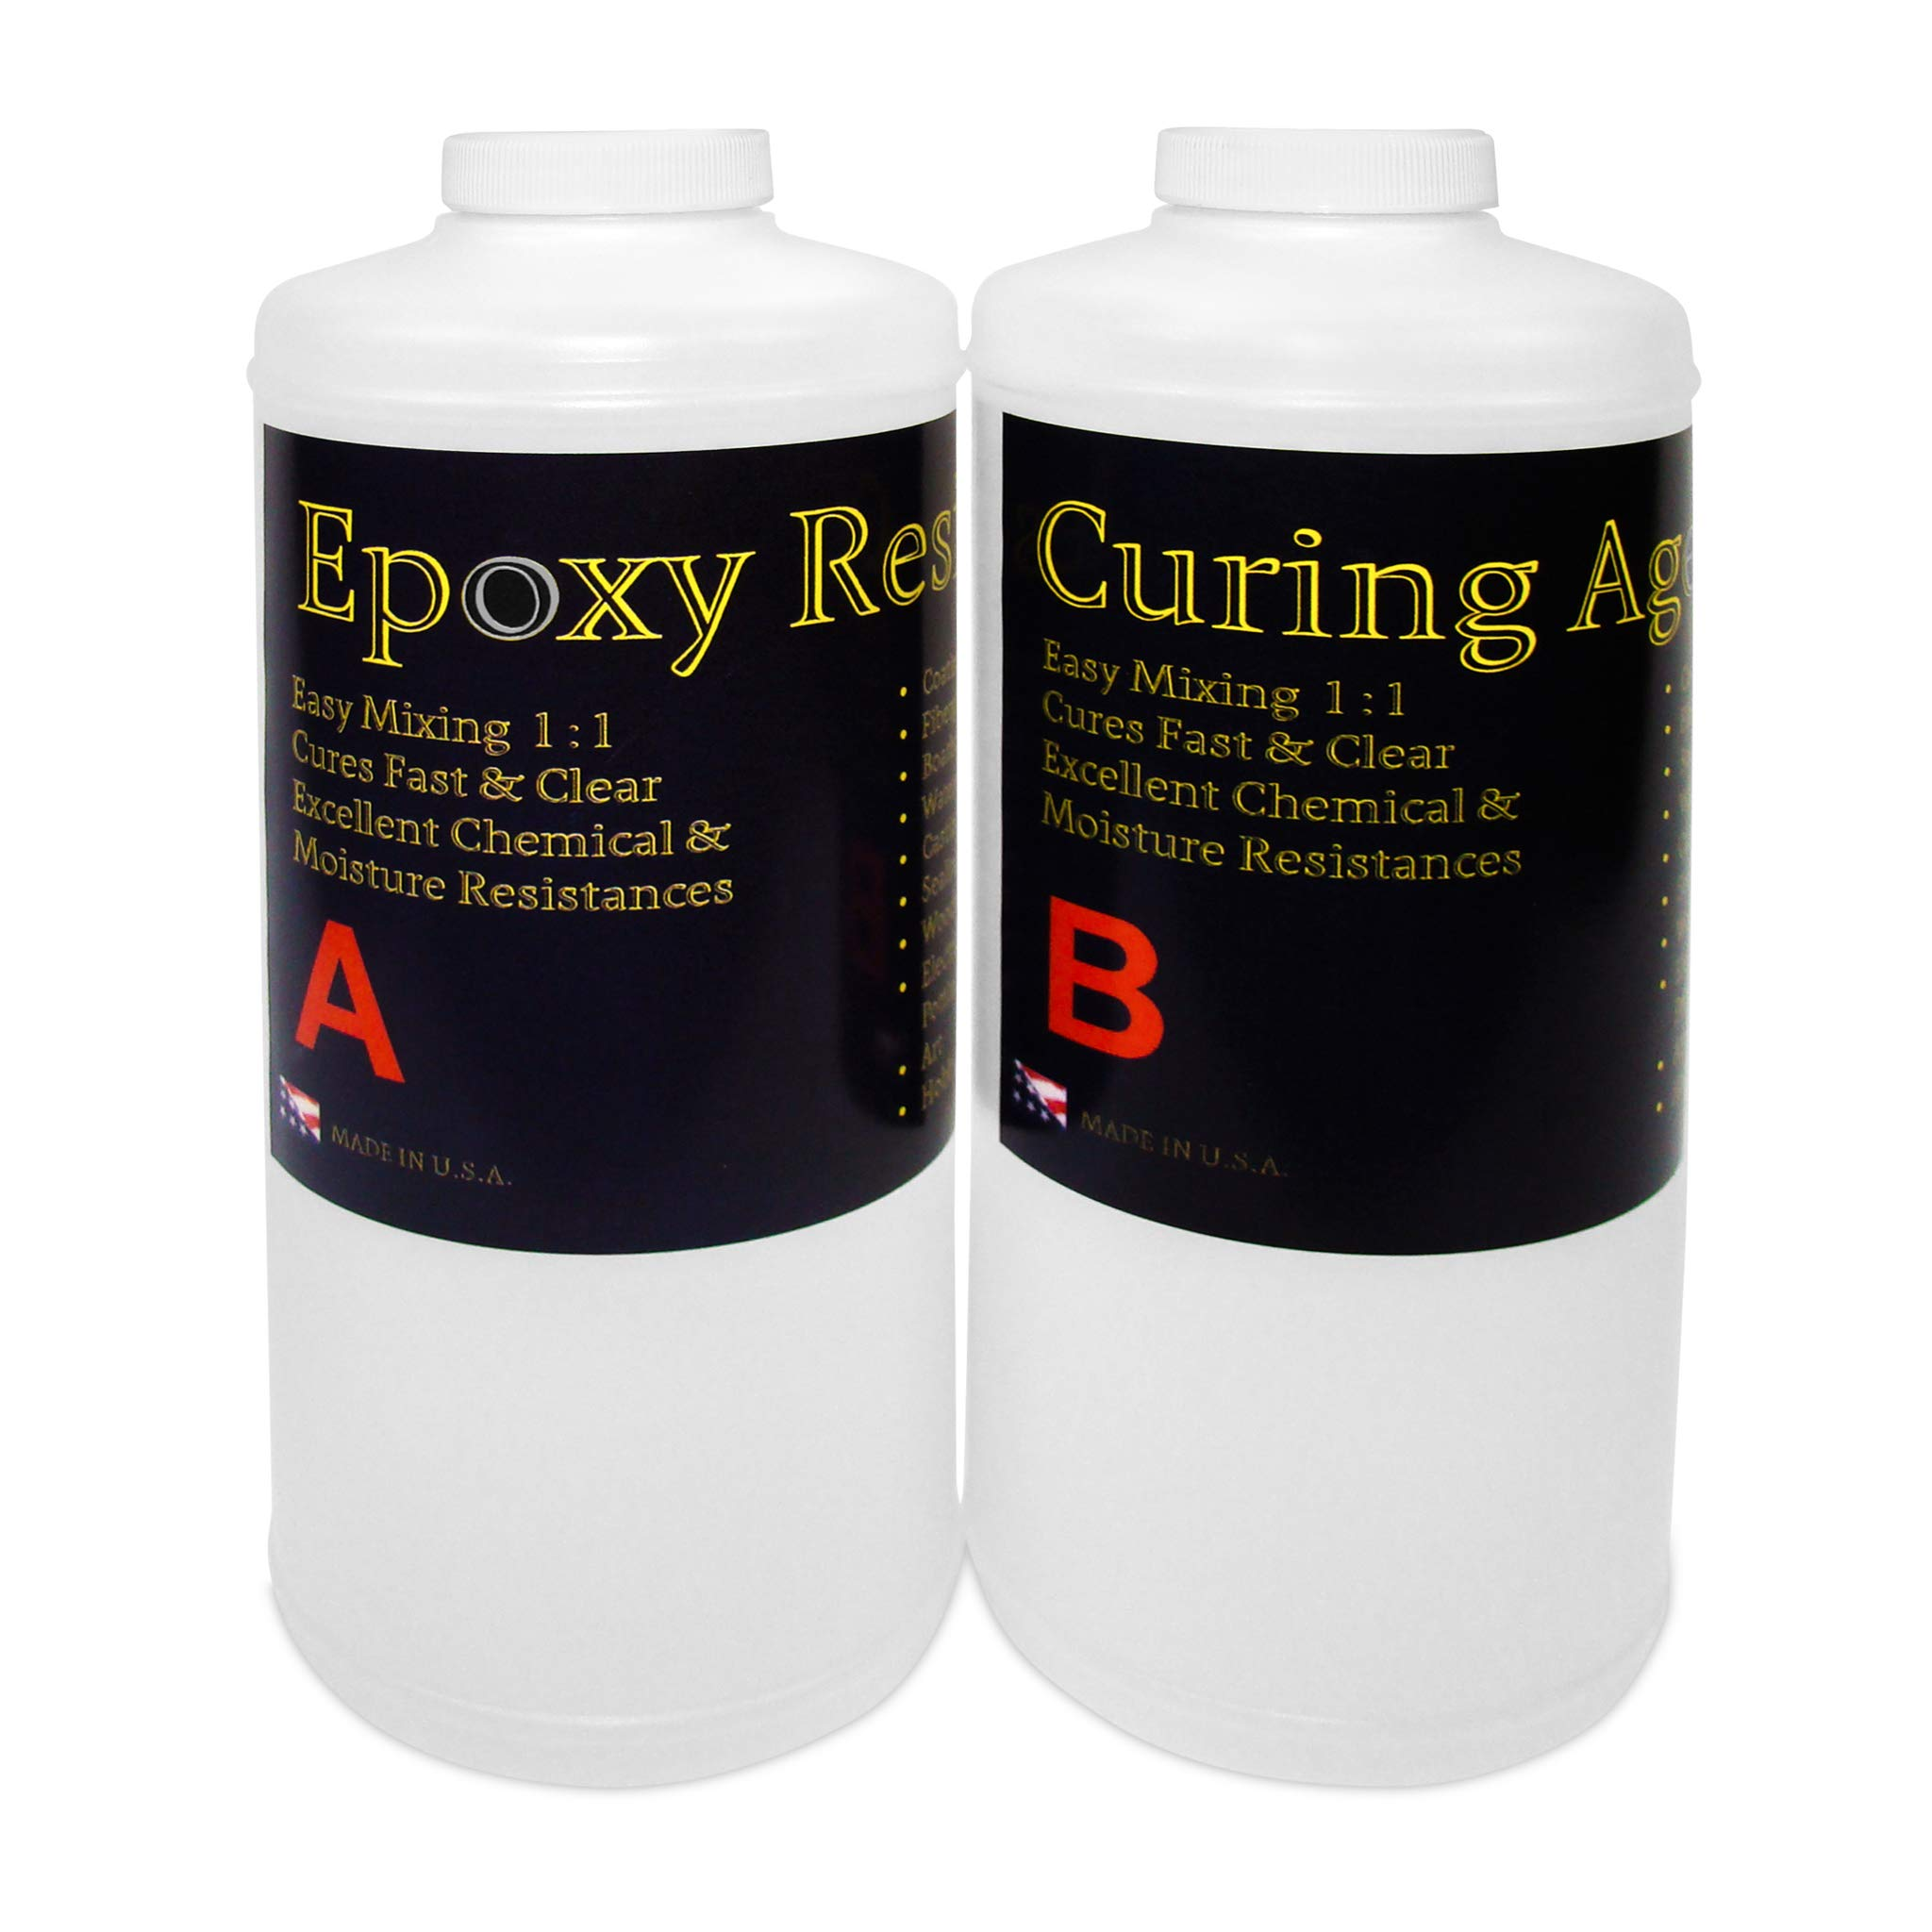 Clear Epoxy Resin for Table Tops, Bars, Fiberglass, Concrete - Professional Grade High Gloss Finish Multi-Purpose Resin - 2 Gallon Kit by Epoxy Resin (Image #4)